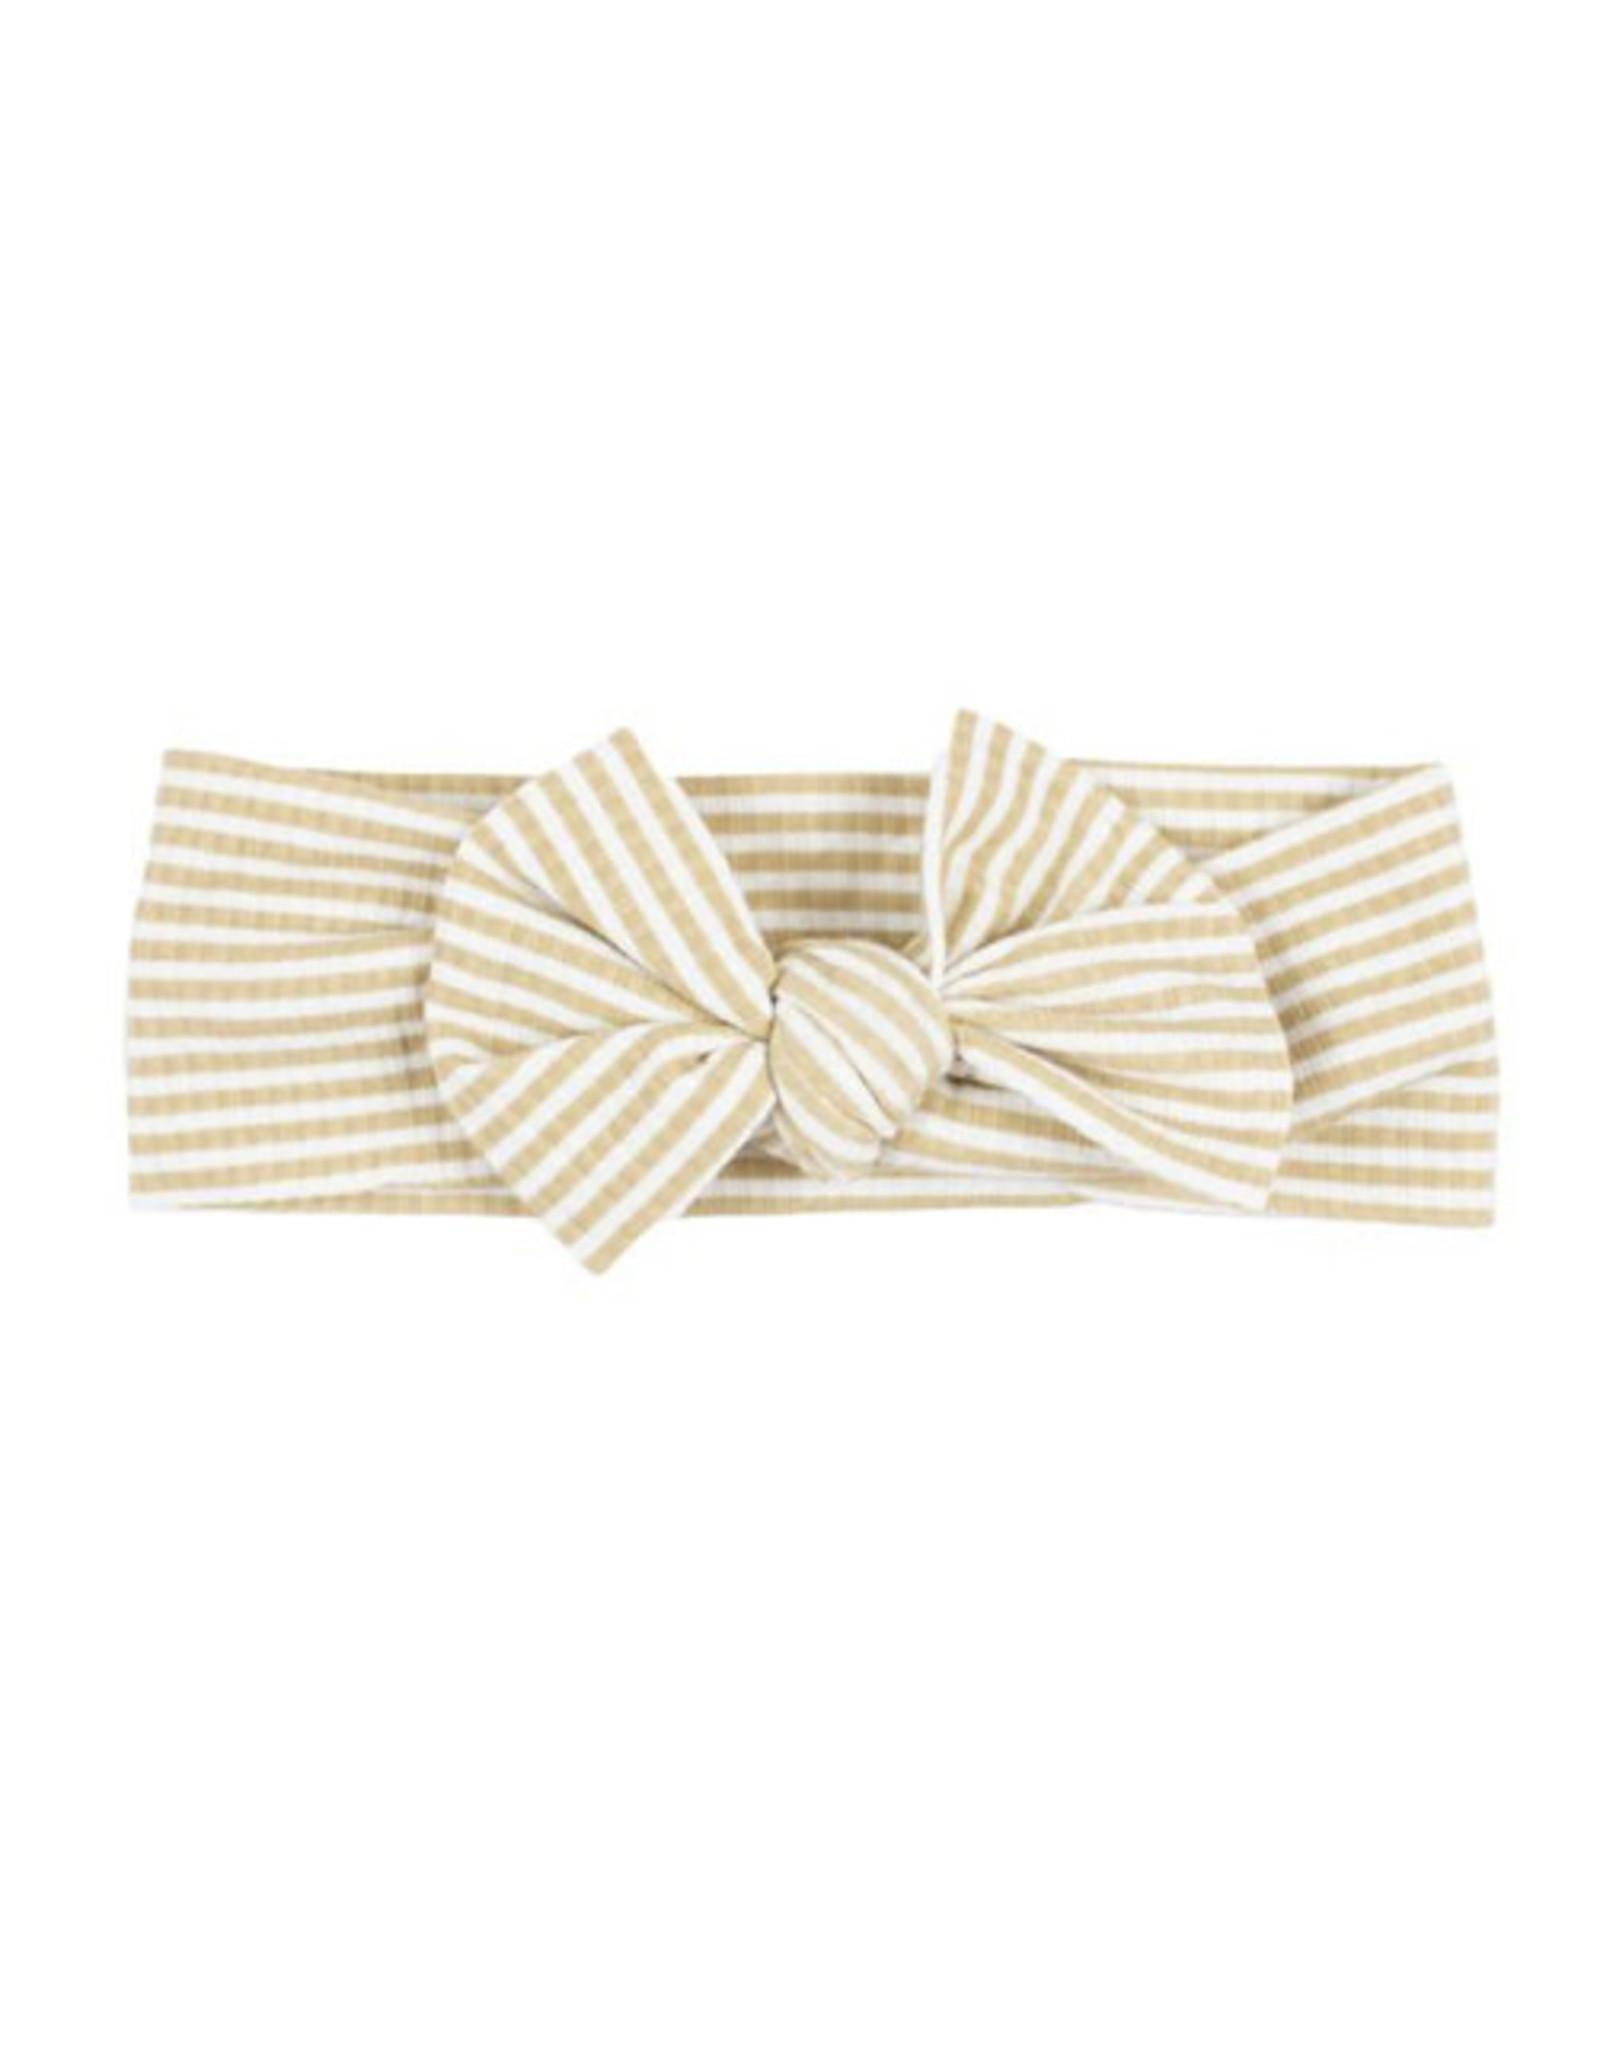 Brave Little Ones Brave Little Ones- Tan Stripe Ribbed Bow Headband